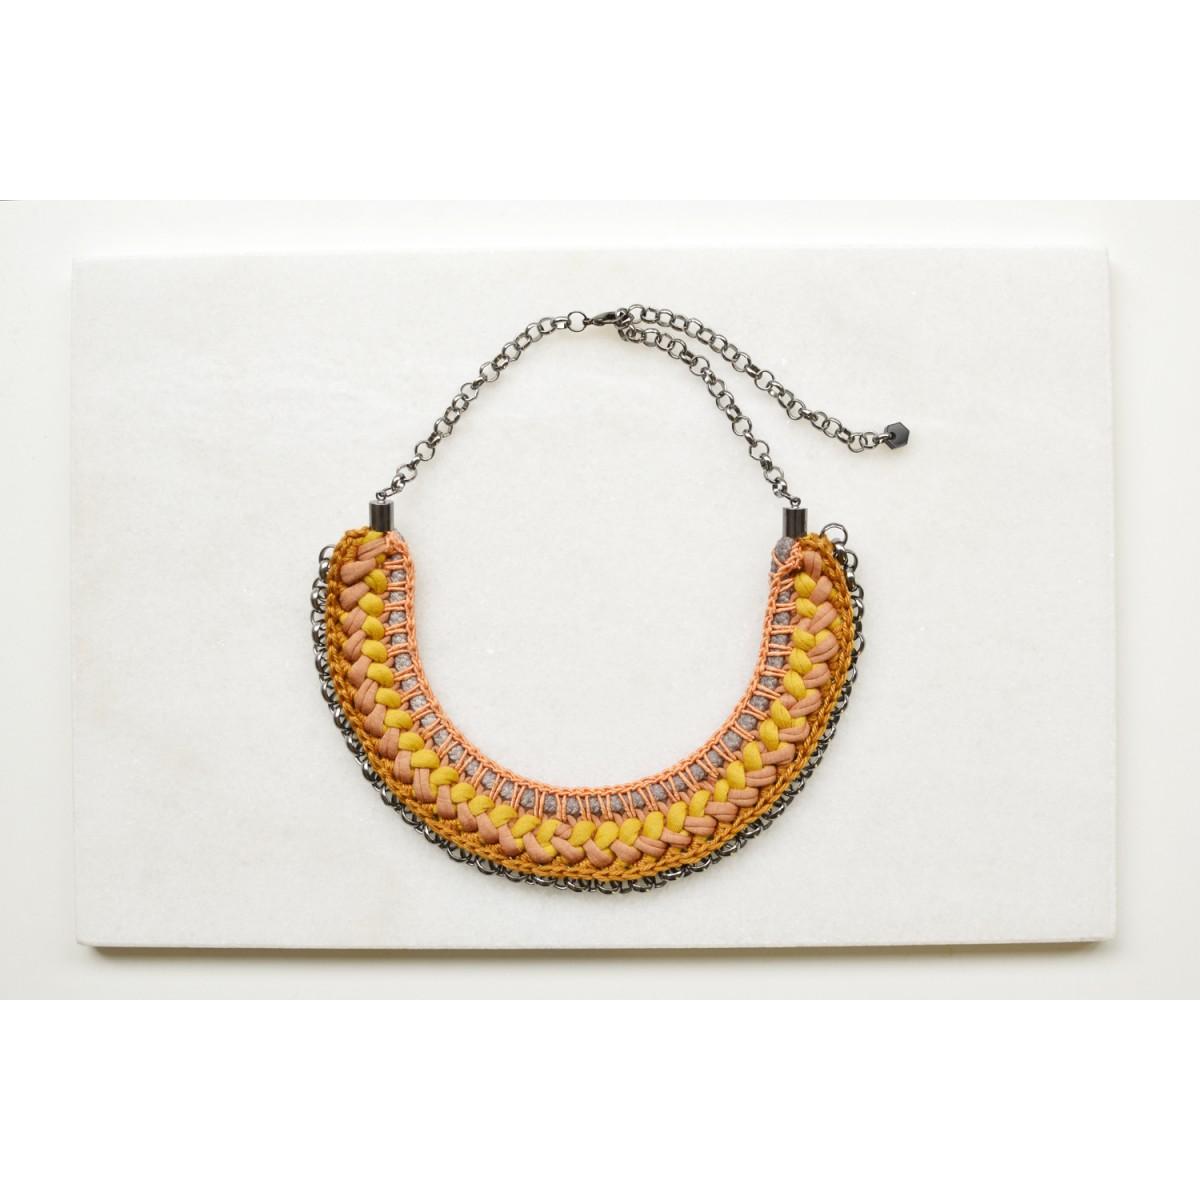 Gudbling // Kurze Boho Halskette Terrakotta